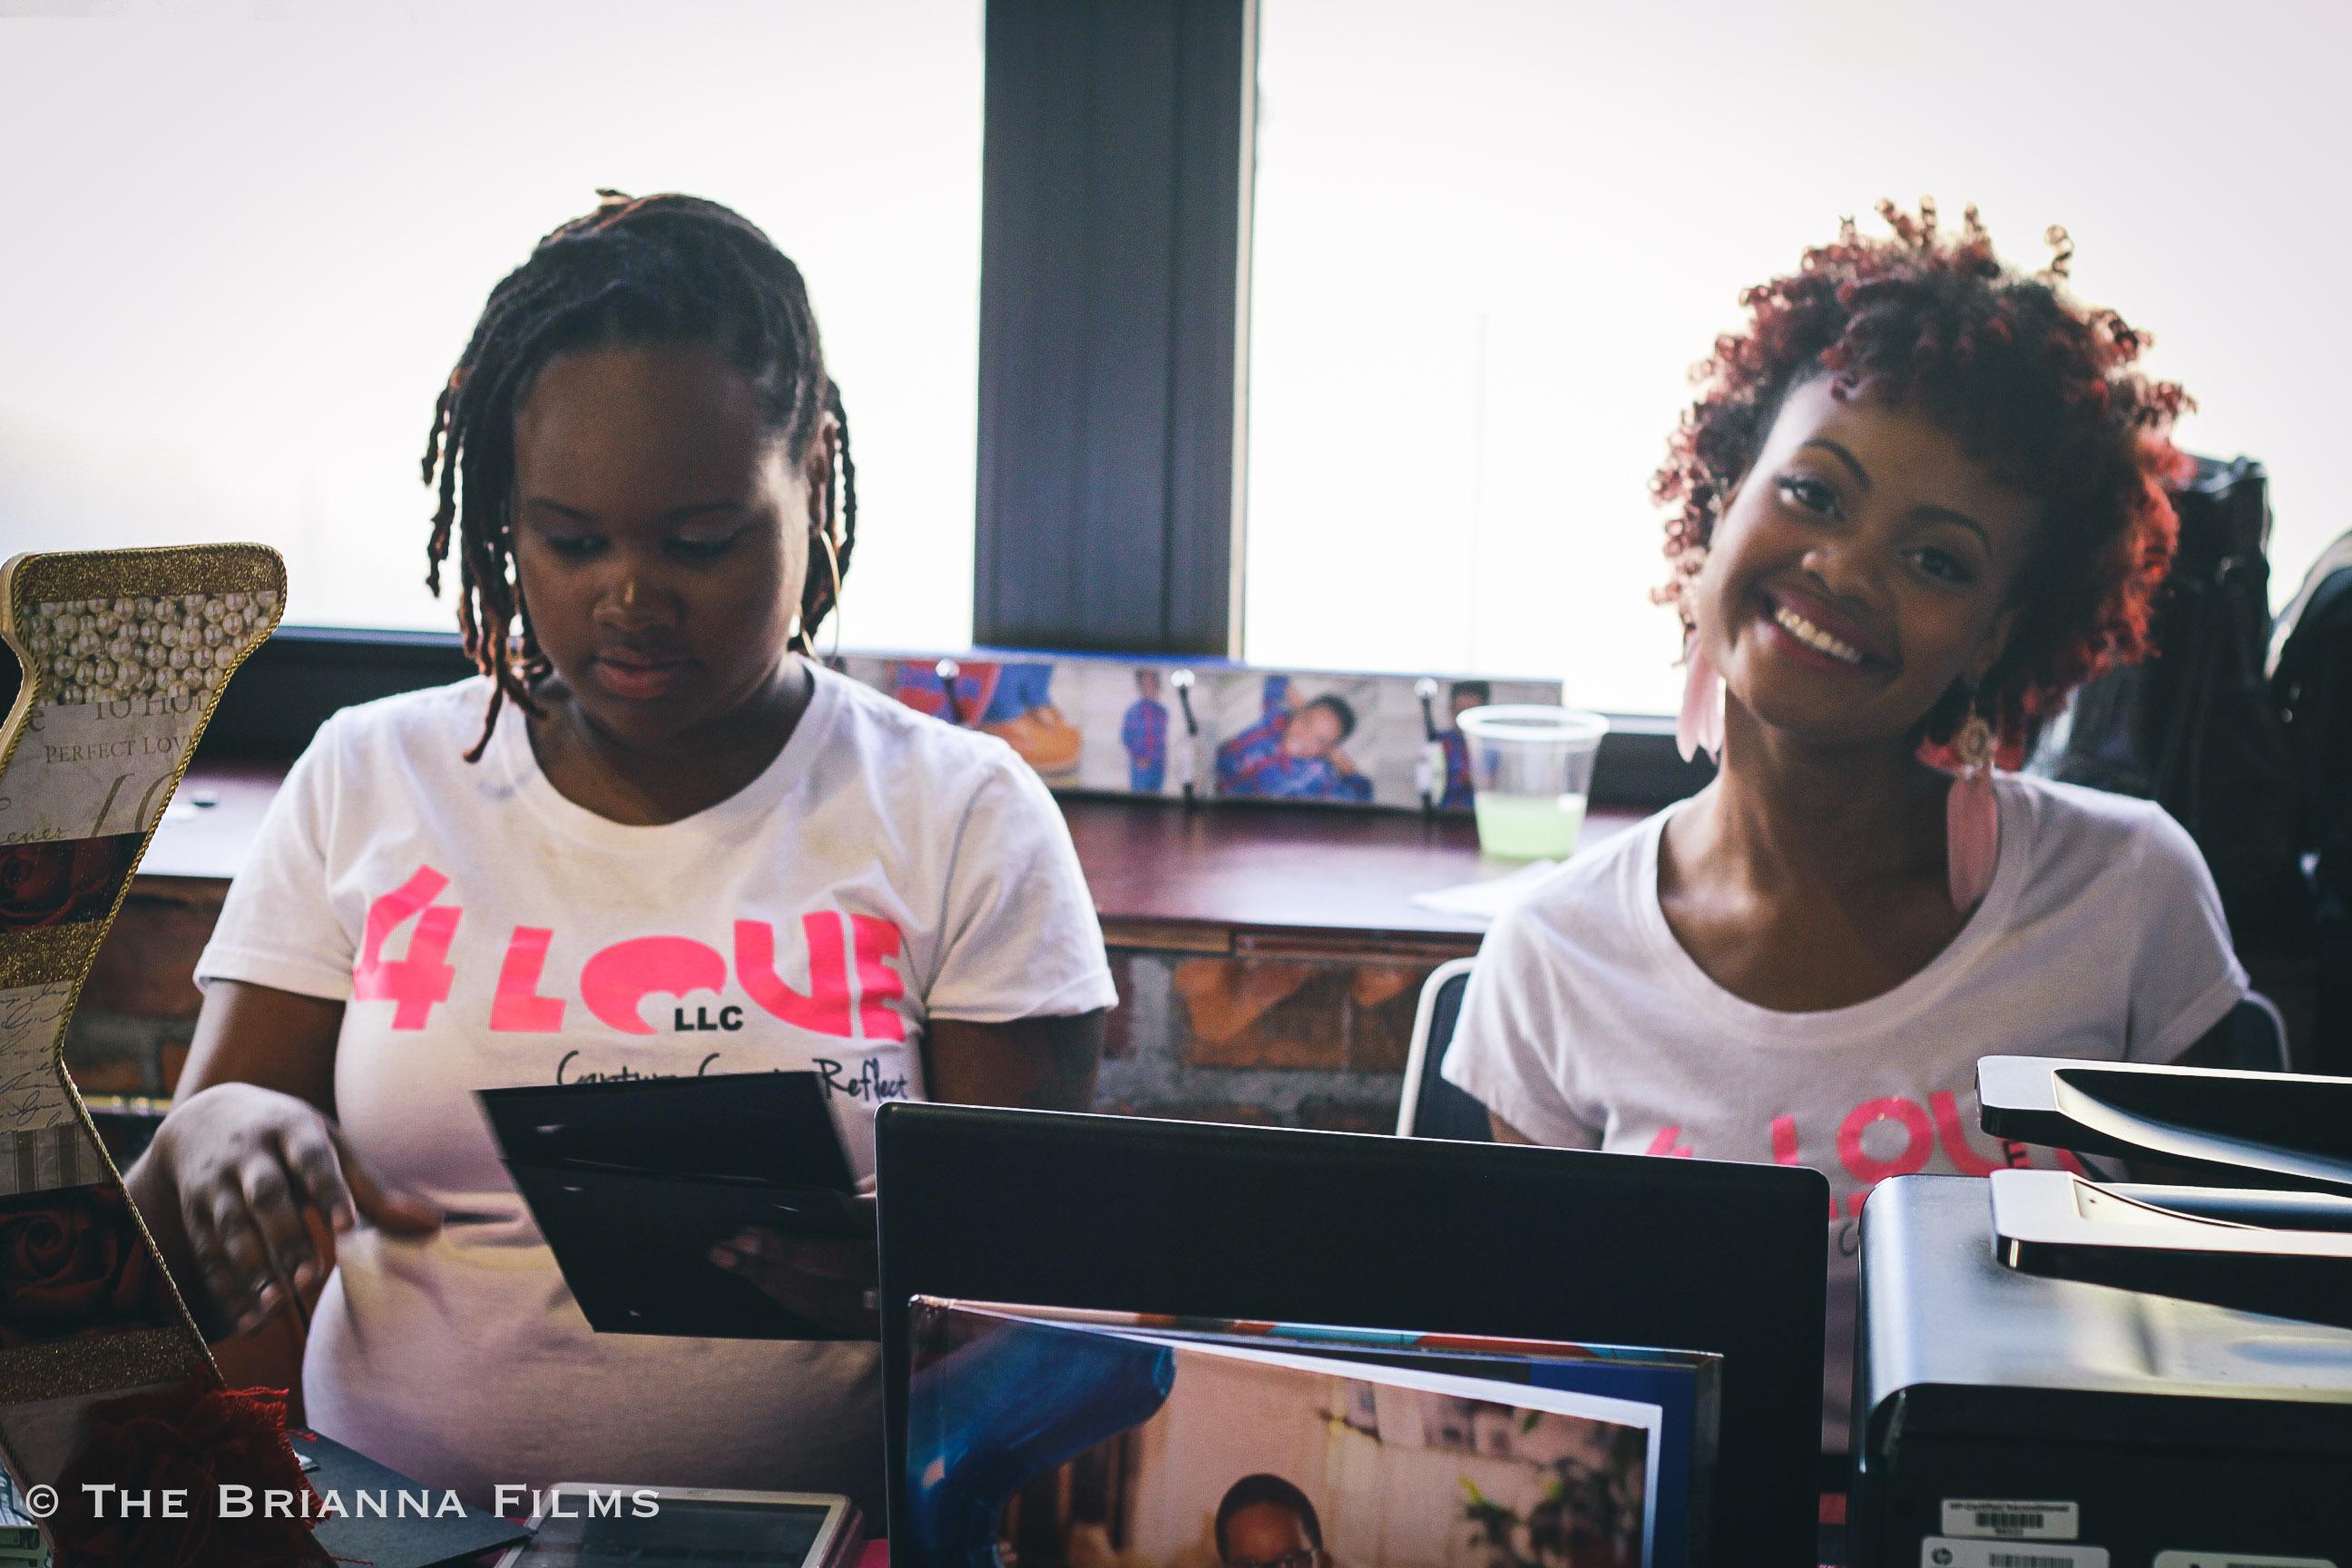 Keisha and Kelli of 4 Love, LLC